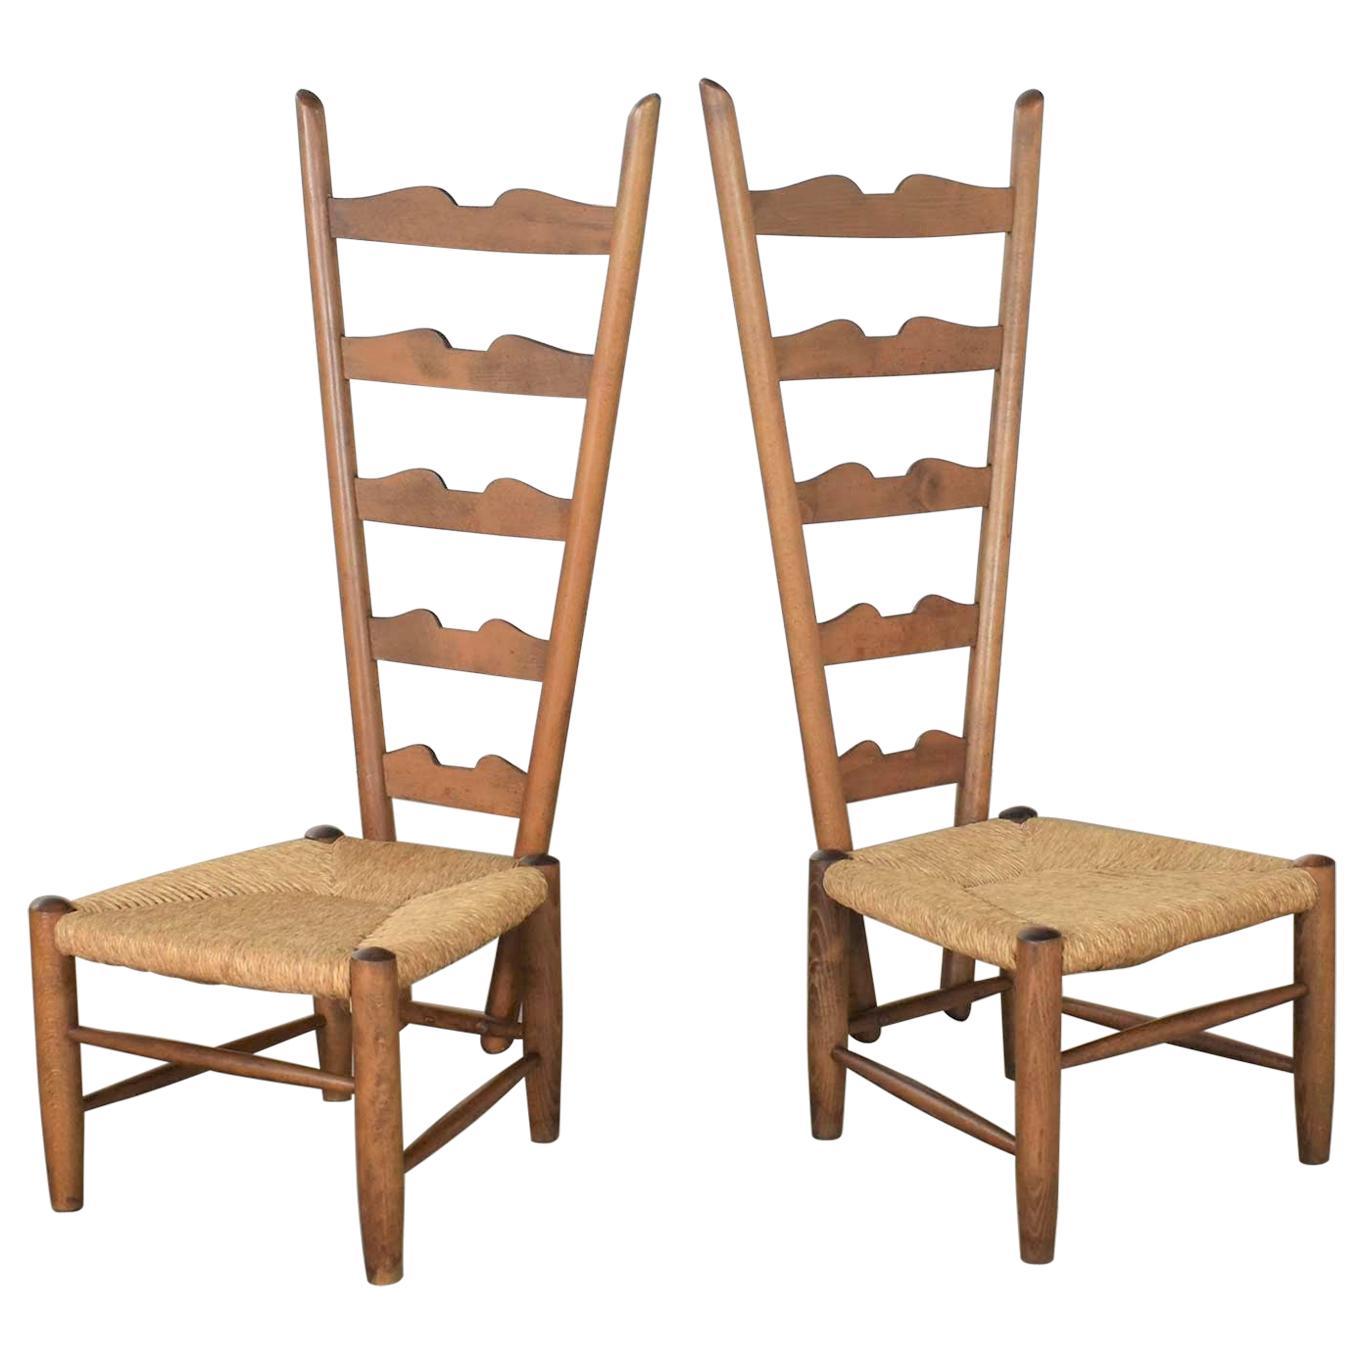 Pair of Vintage Fireside Ladderback Chairs by Gio Ponti for Casa e Giardino